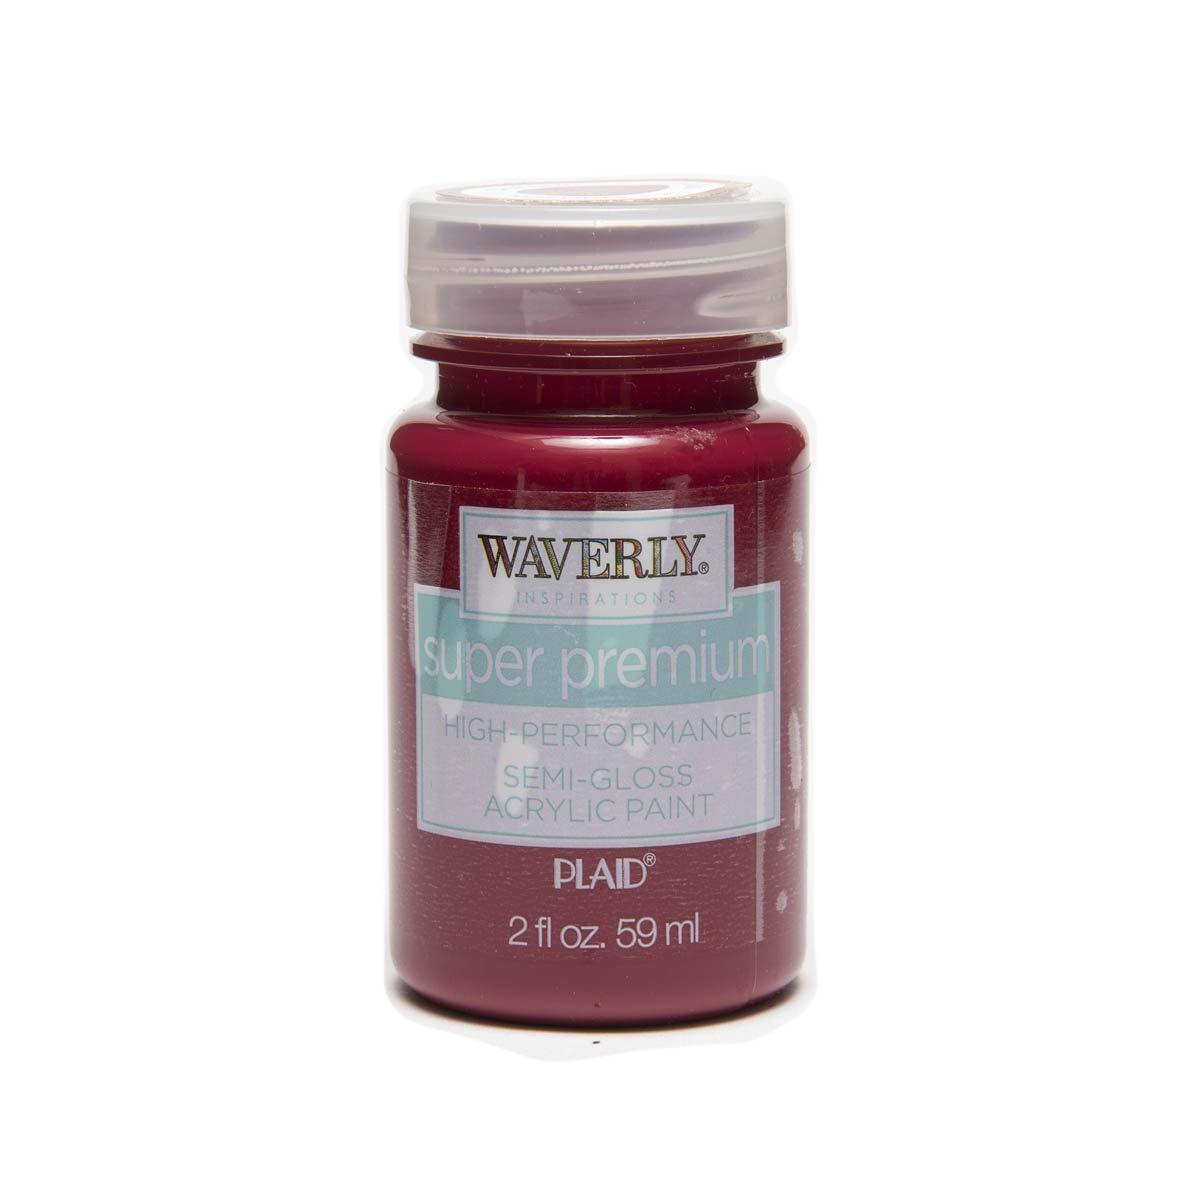 Waverly ® Inspirations Super Premium Semi-Gloss Acrylic Paint - Crimson, 2 oz.